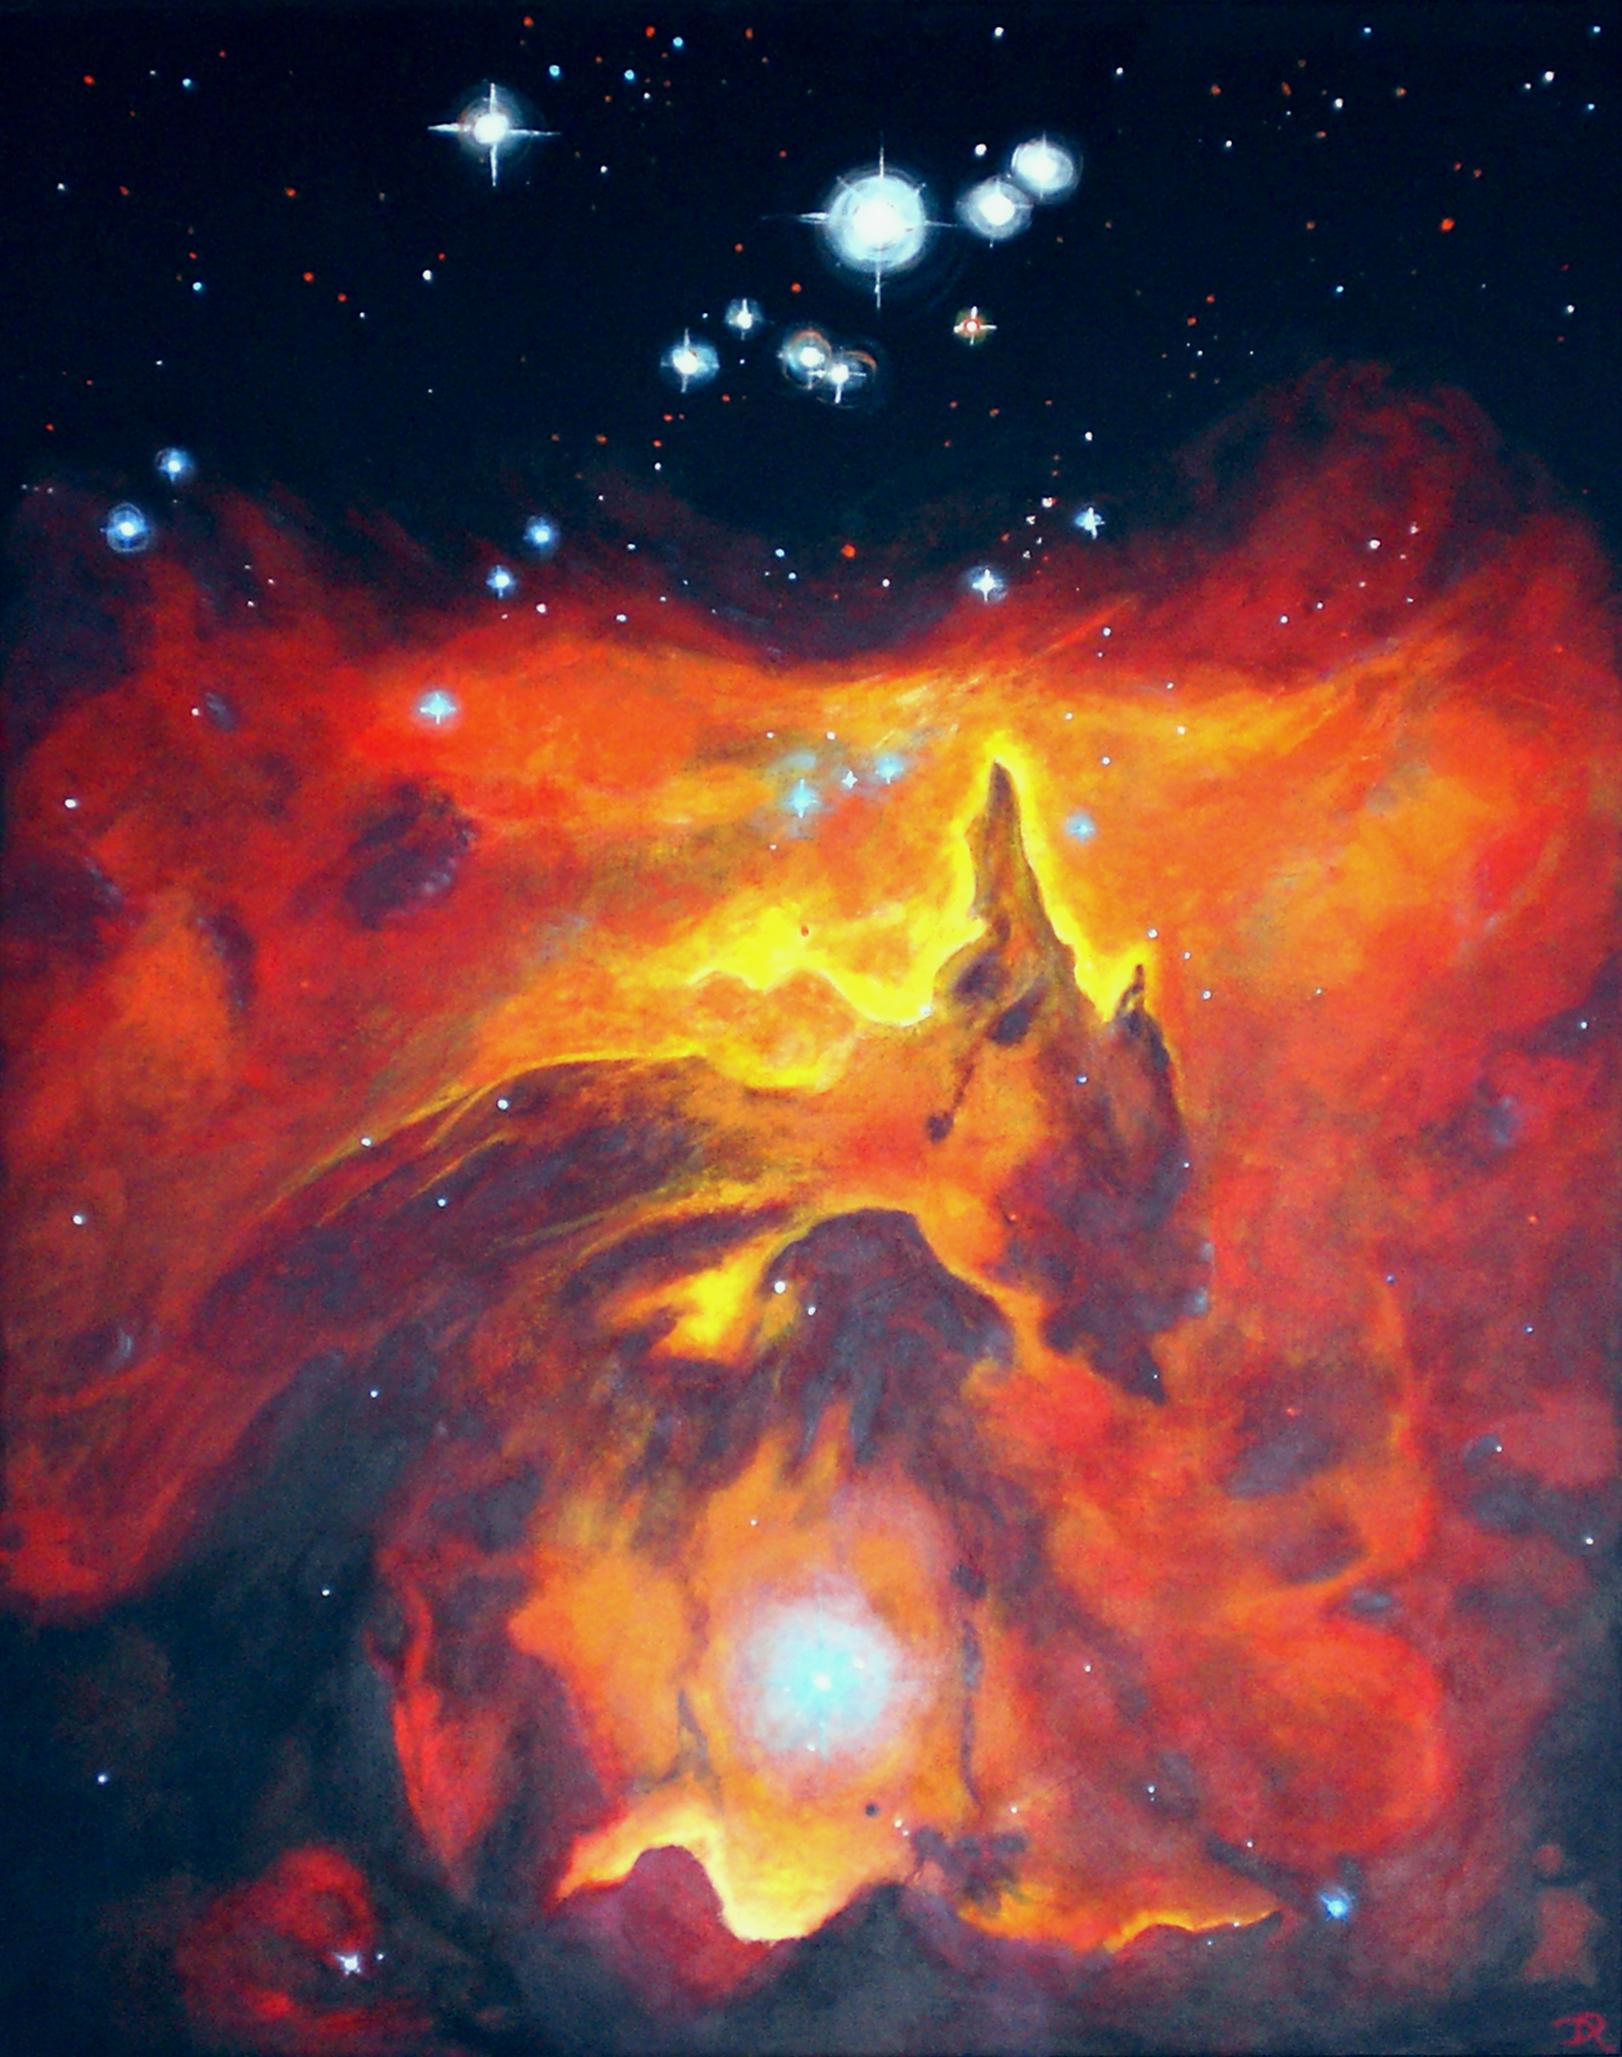 Pismis 24 im Emissionsnebel NGC 6357